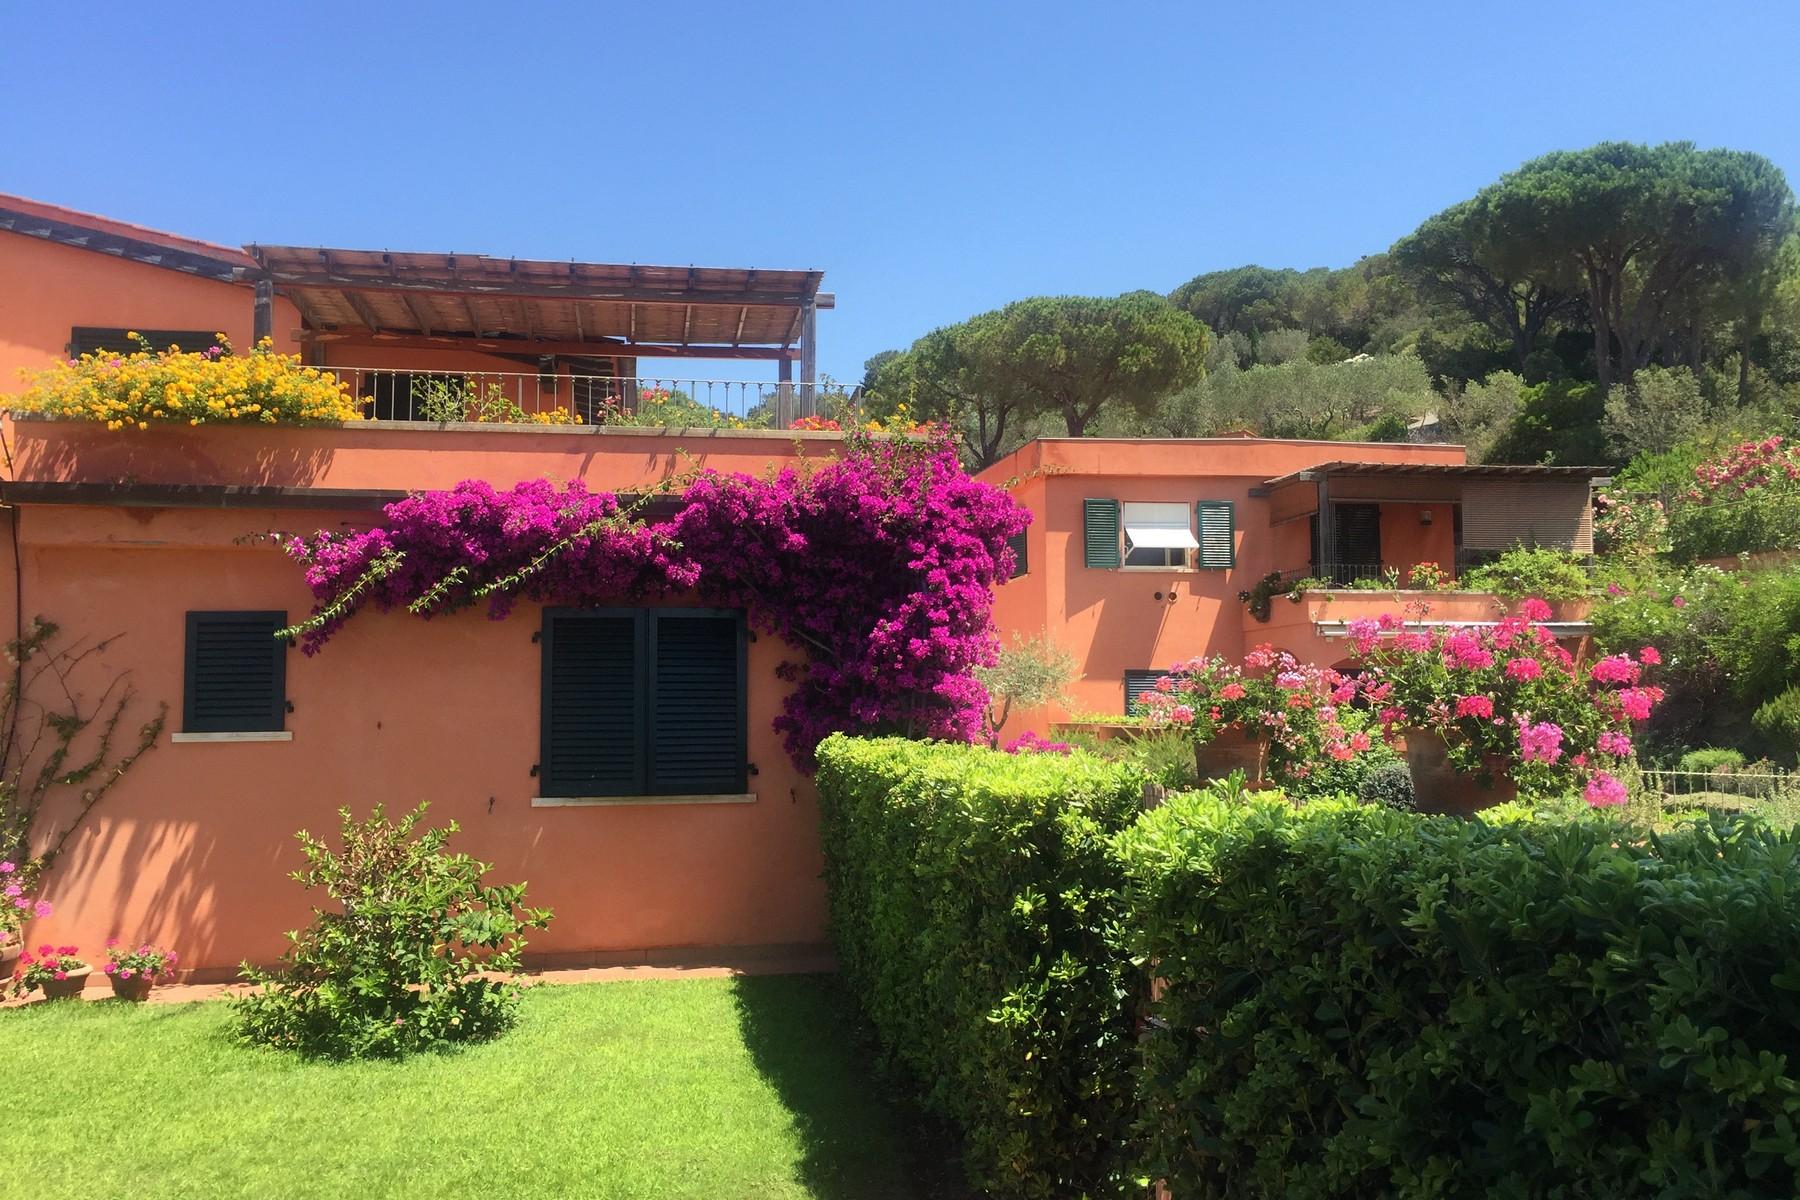 Casa indipendente in Vendita a Capoliveri: 5 locali, 190 mq - Foto 4